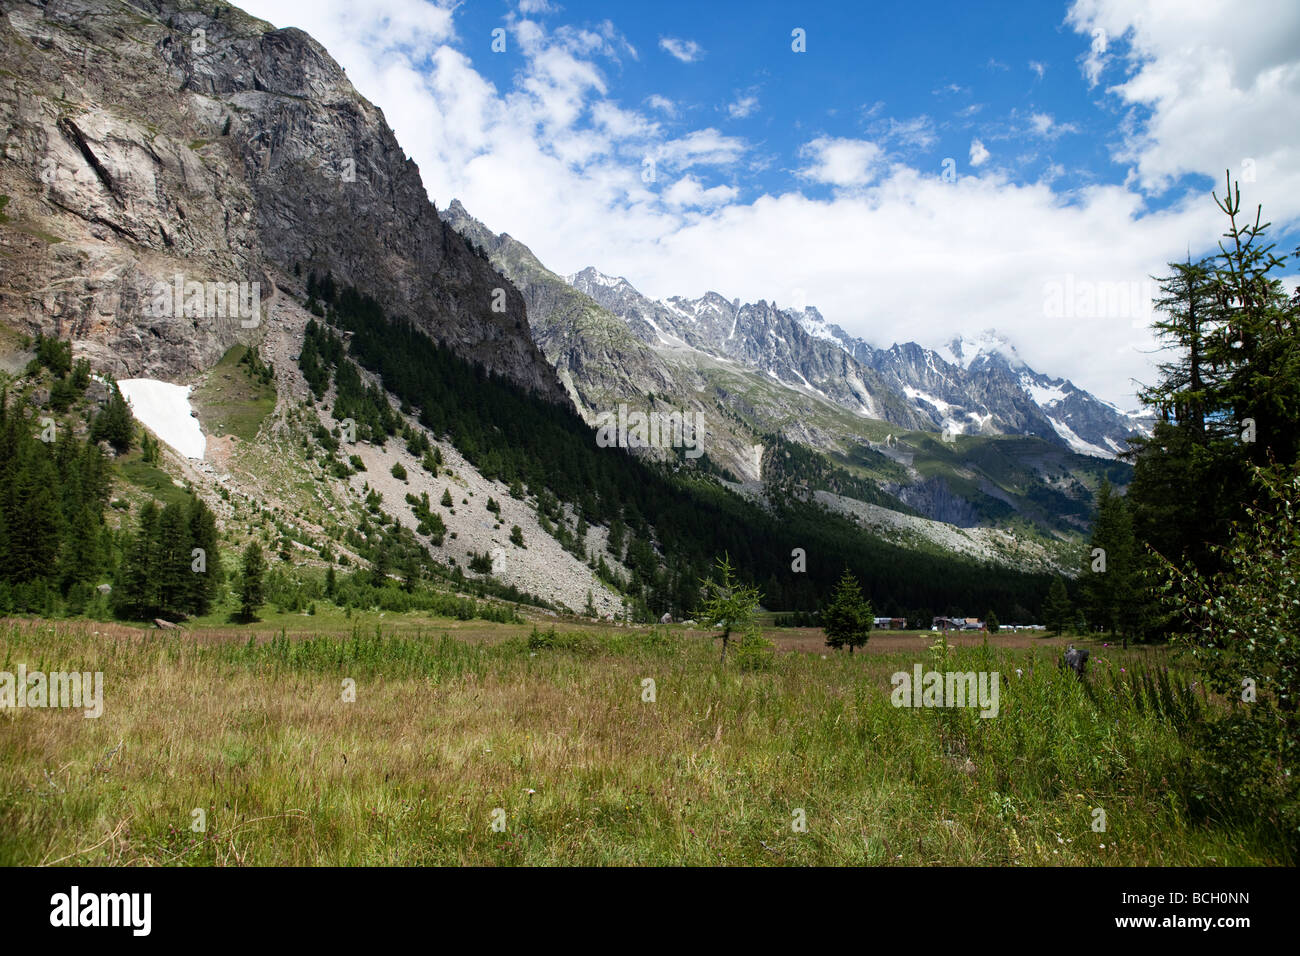 Monte Bianco, Val Veny, Valle d'Aosta, Italy. Alpine valley - Stock Image